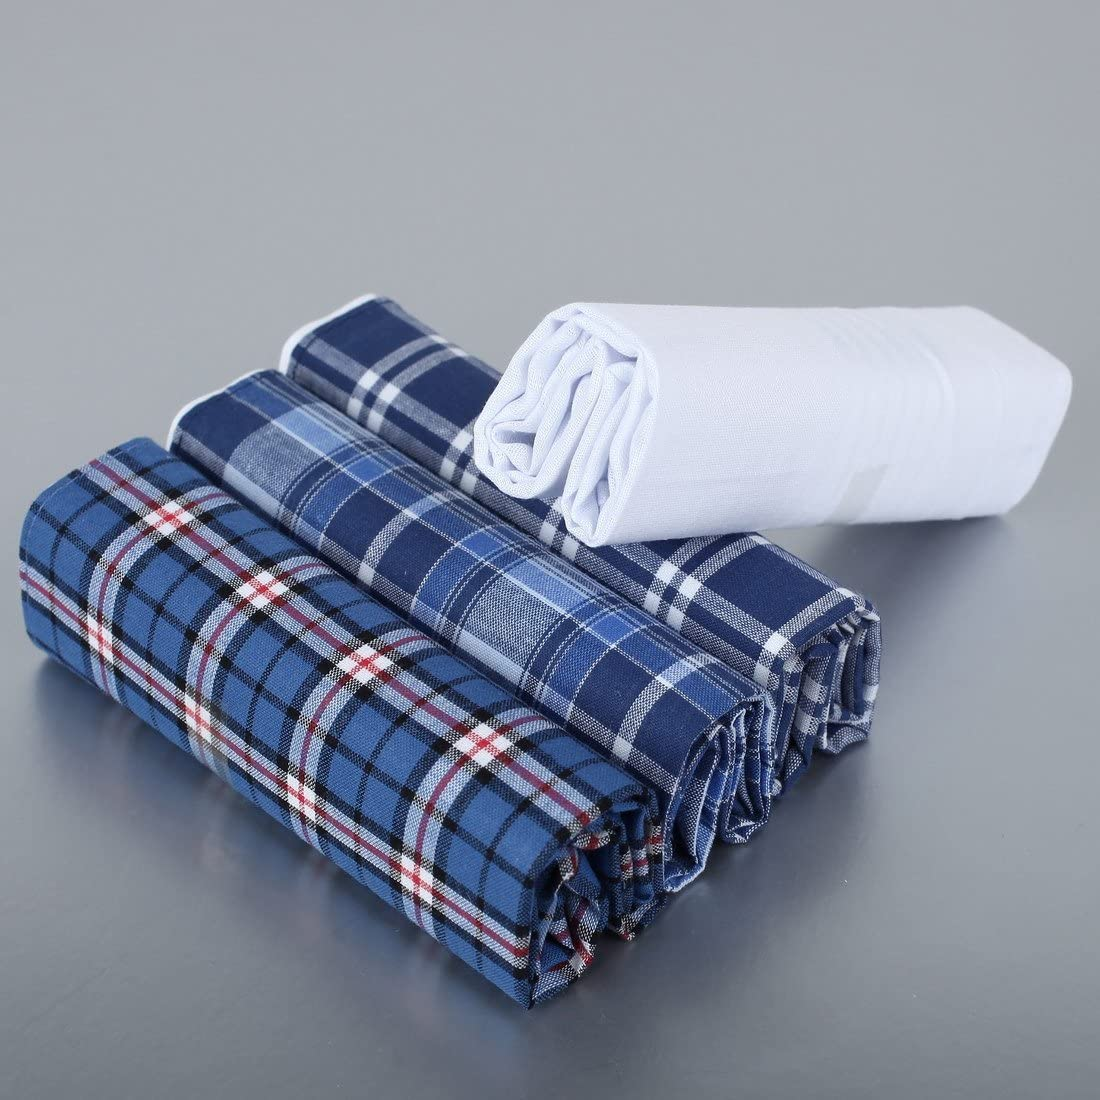 Y/&G Mens Fashion Handmade Fabric 4 Pack Cotton Handkerchiefs Set Pretty Designer